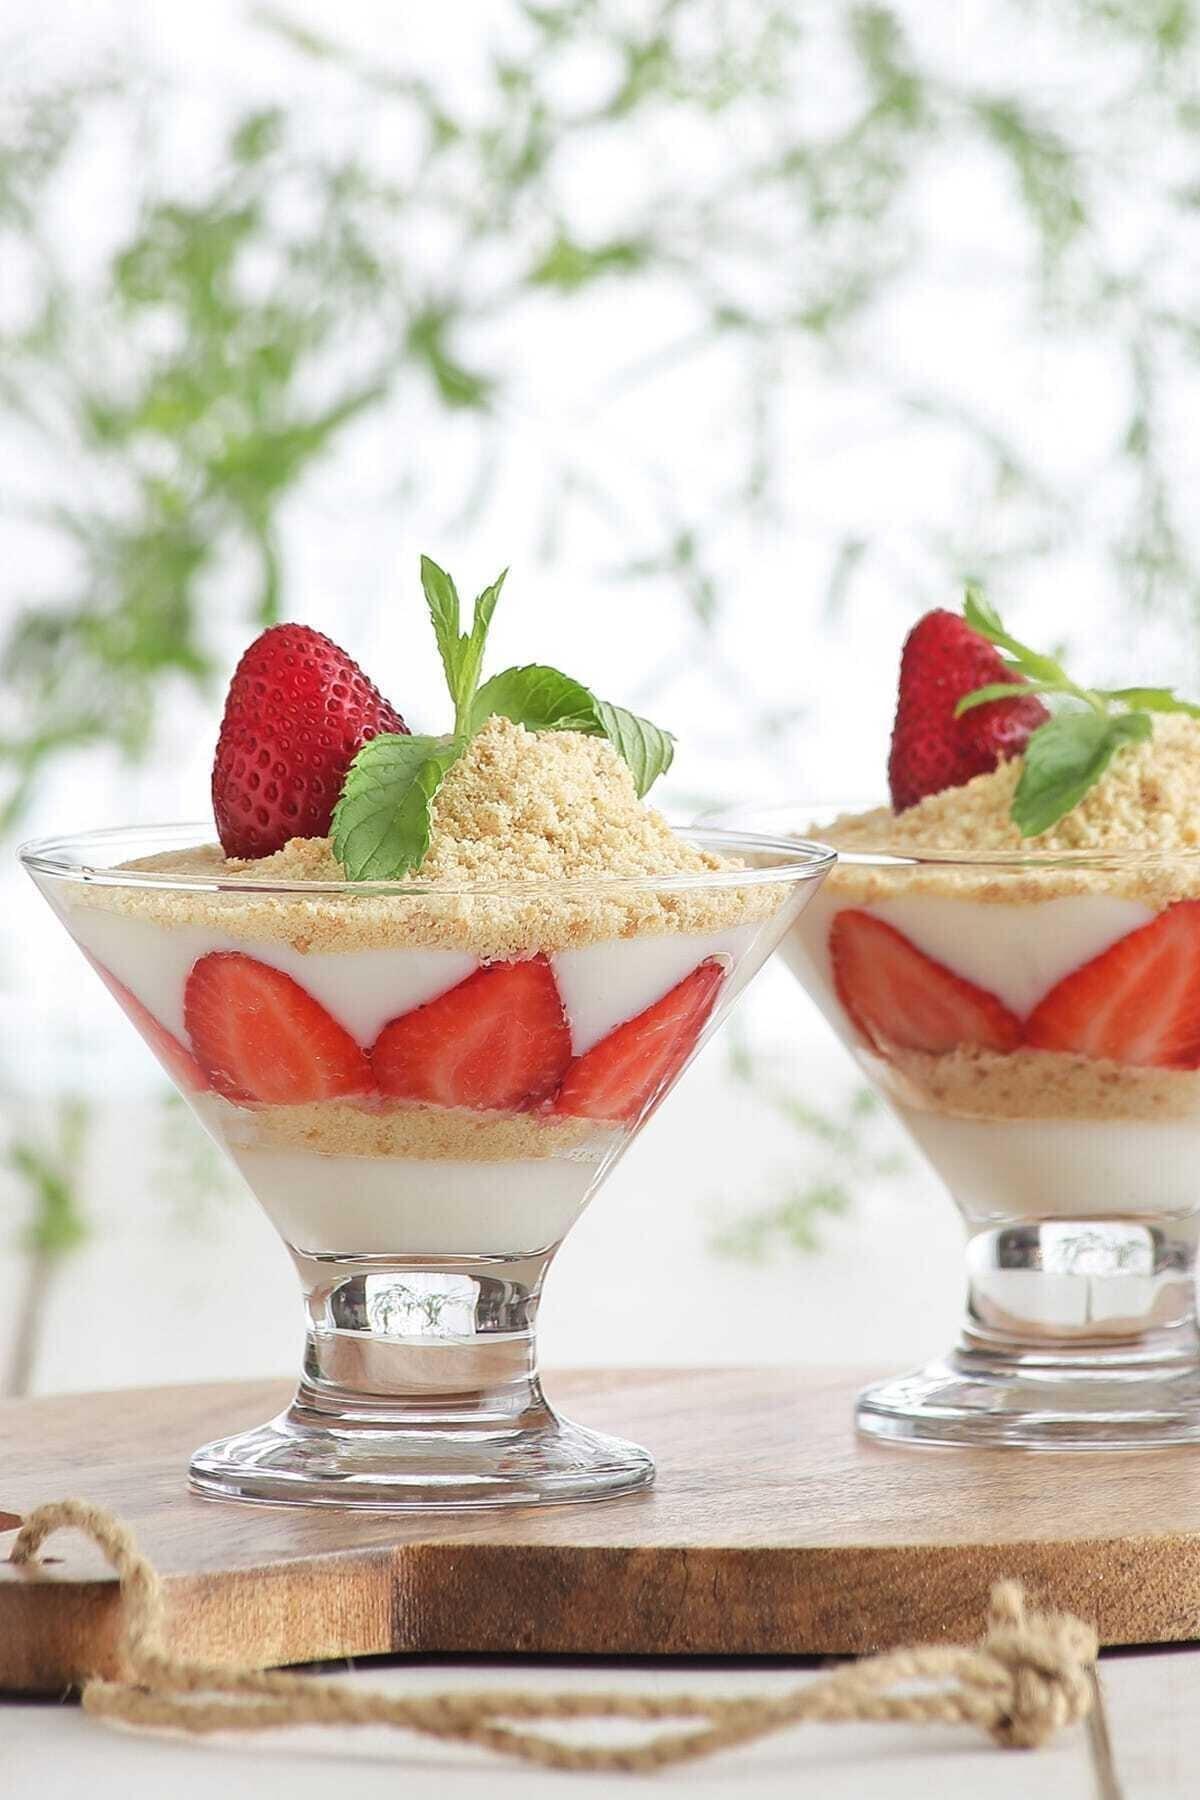 LAV Crema 6'lı Dondurmalık-tatlı Servisi 1